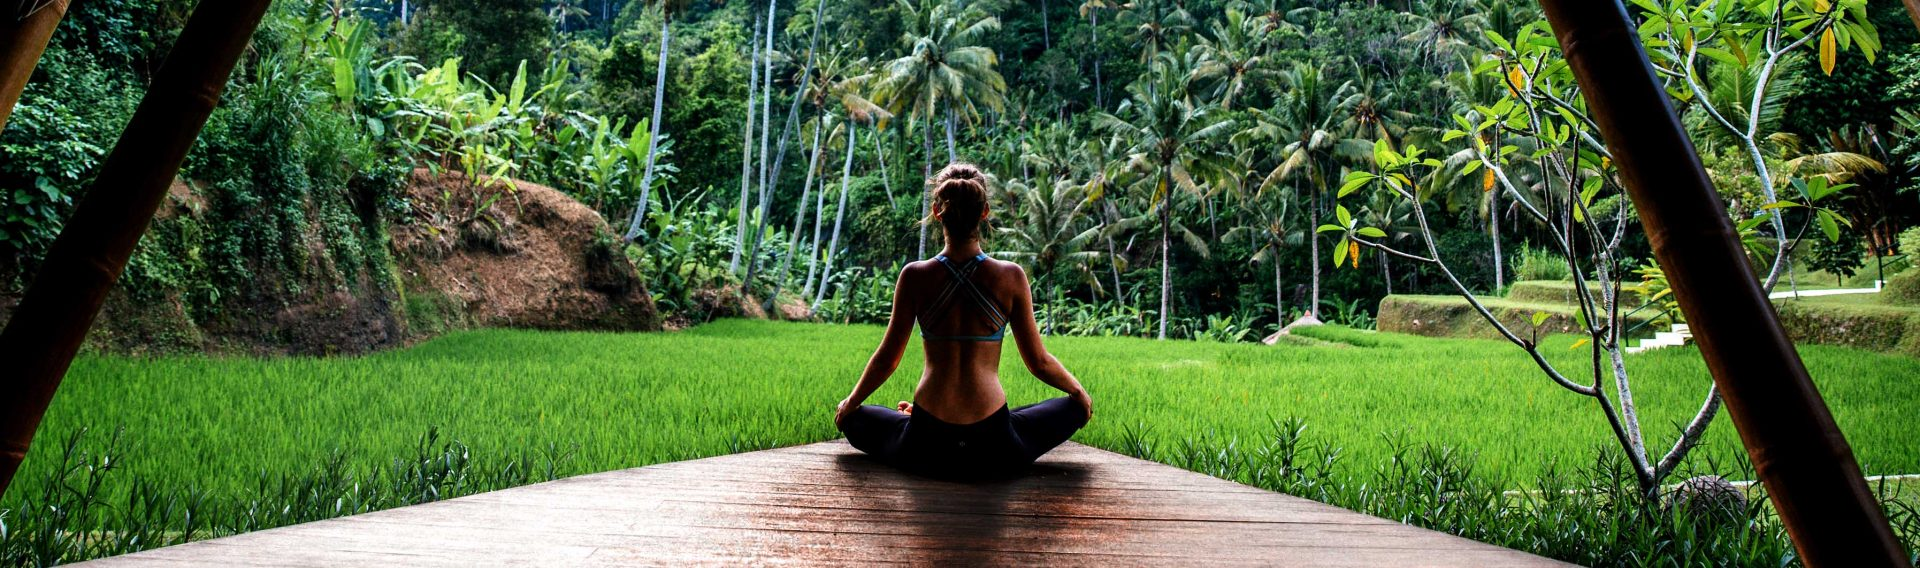 yoga all'aria aperta